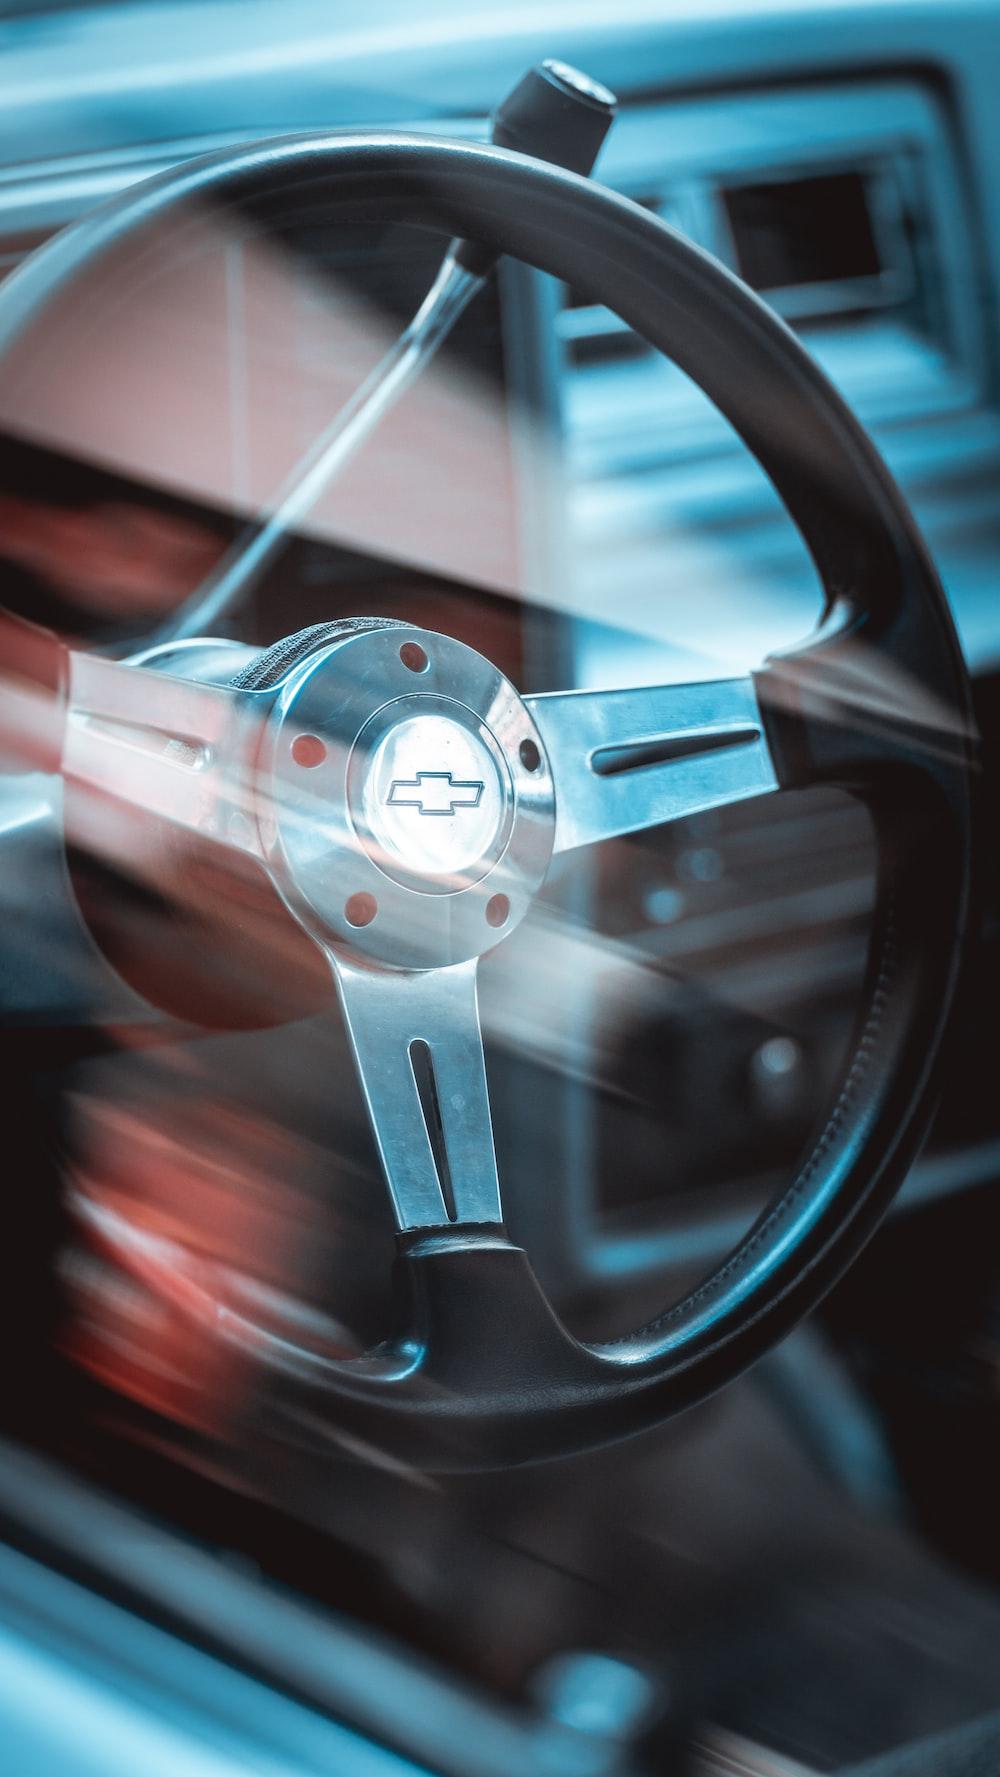 shallow focus photo of gray Chevrolet steering wheel